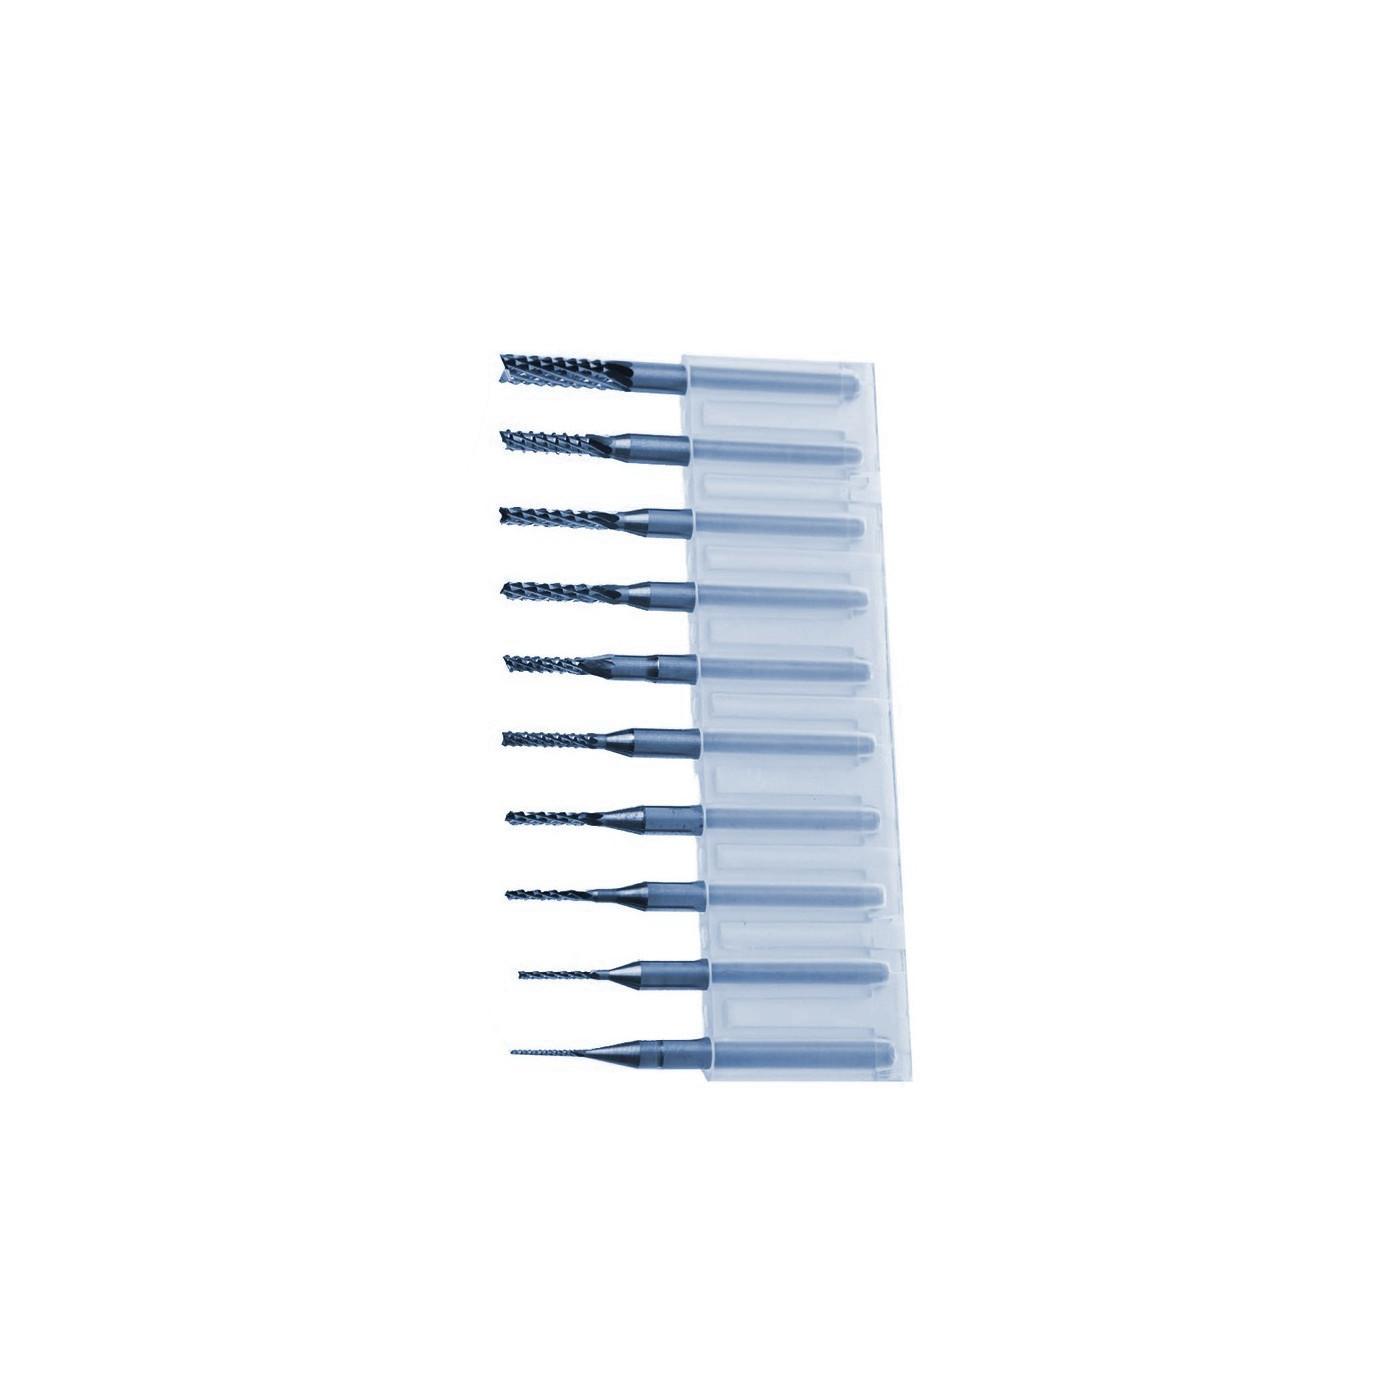 Micro HQ frezen set in box (0.8-3.175 mm)  - 1